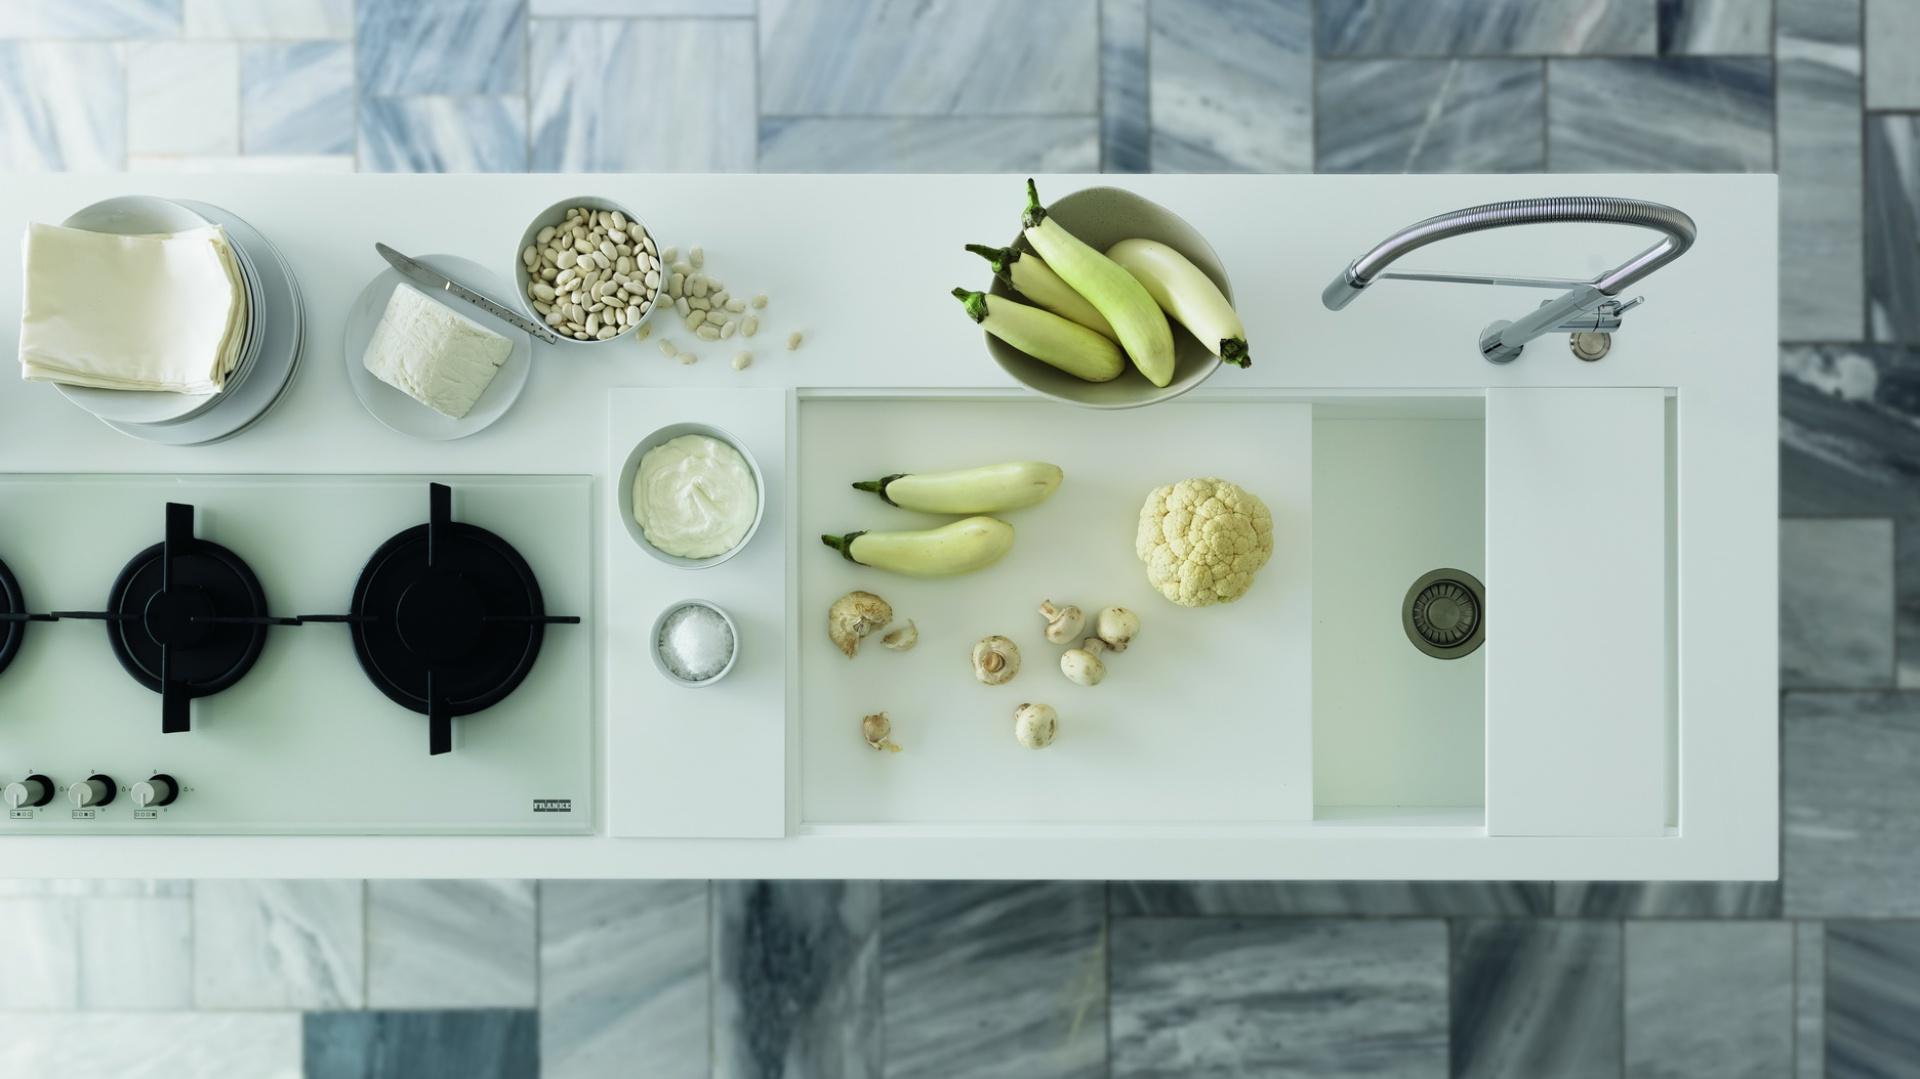 Blat kuchenny Solid Surface. Fot. Franke